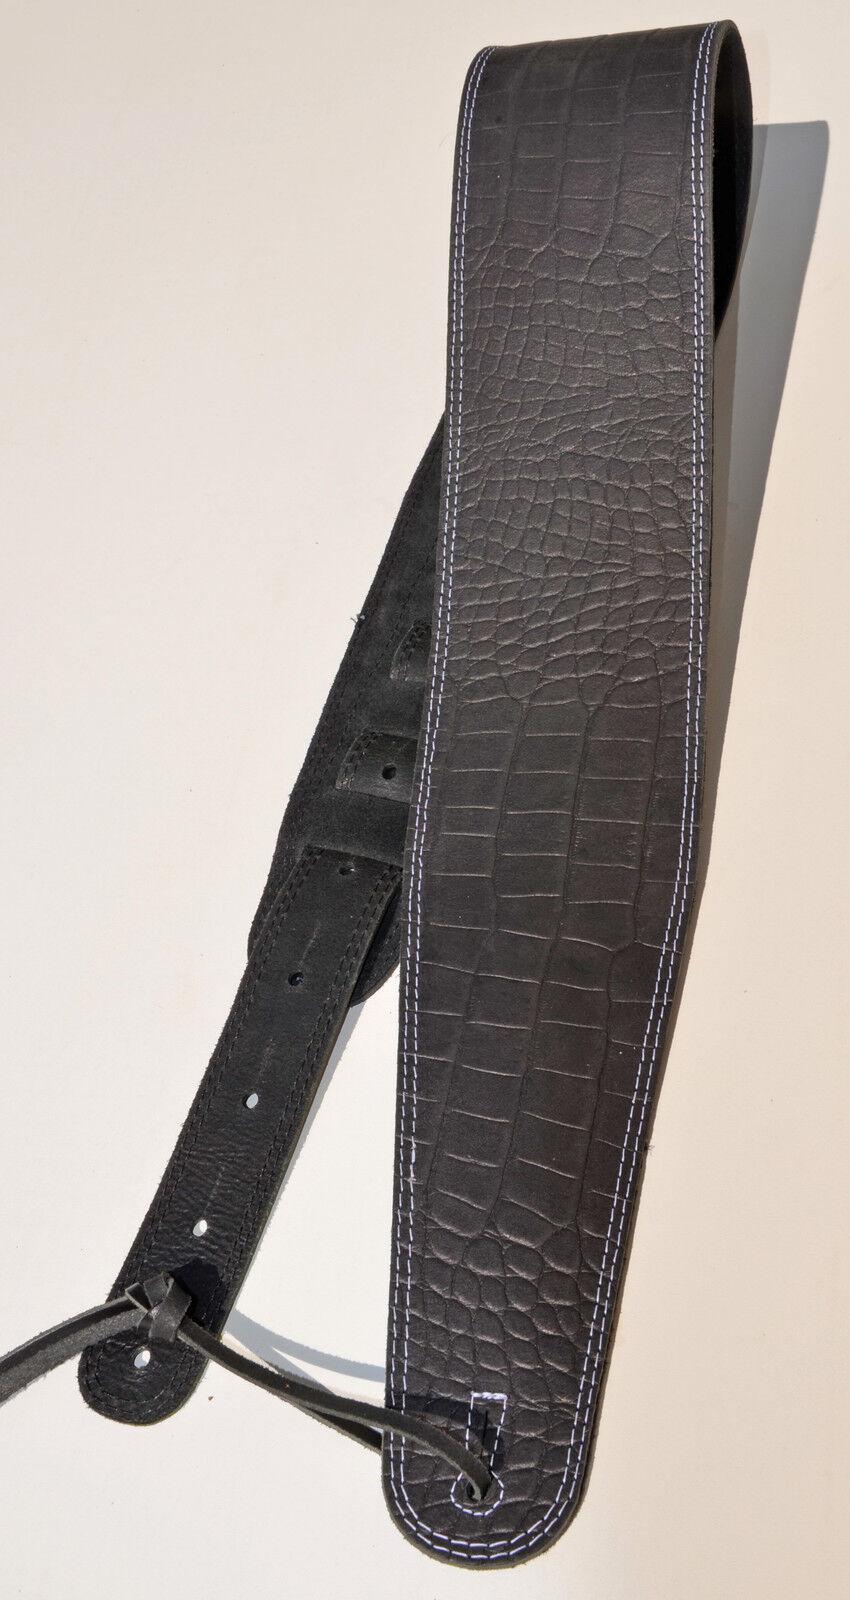 Bassgurt Gitarrengurt Blau Bud Factory Big Bro 10 cm breit Bass Guitar strap